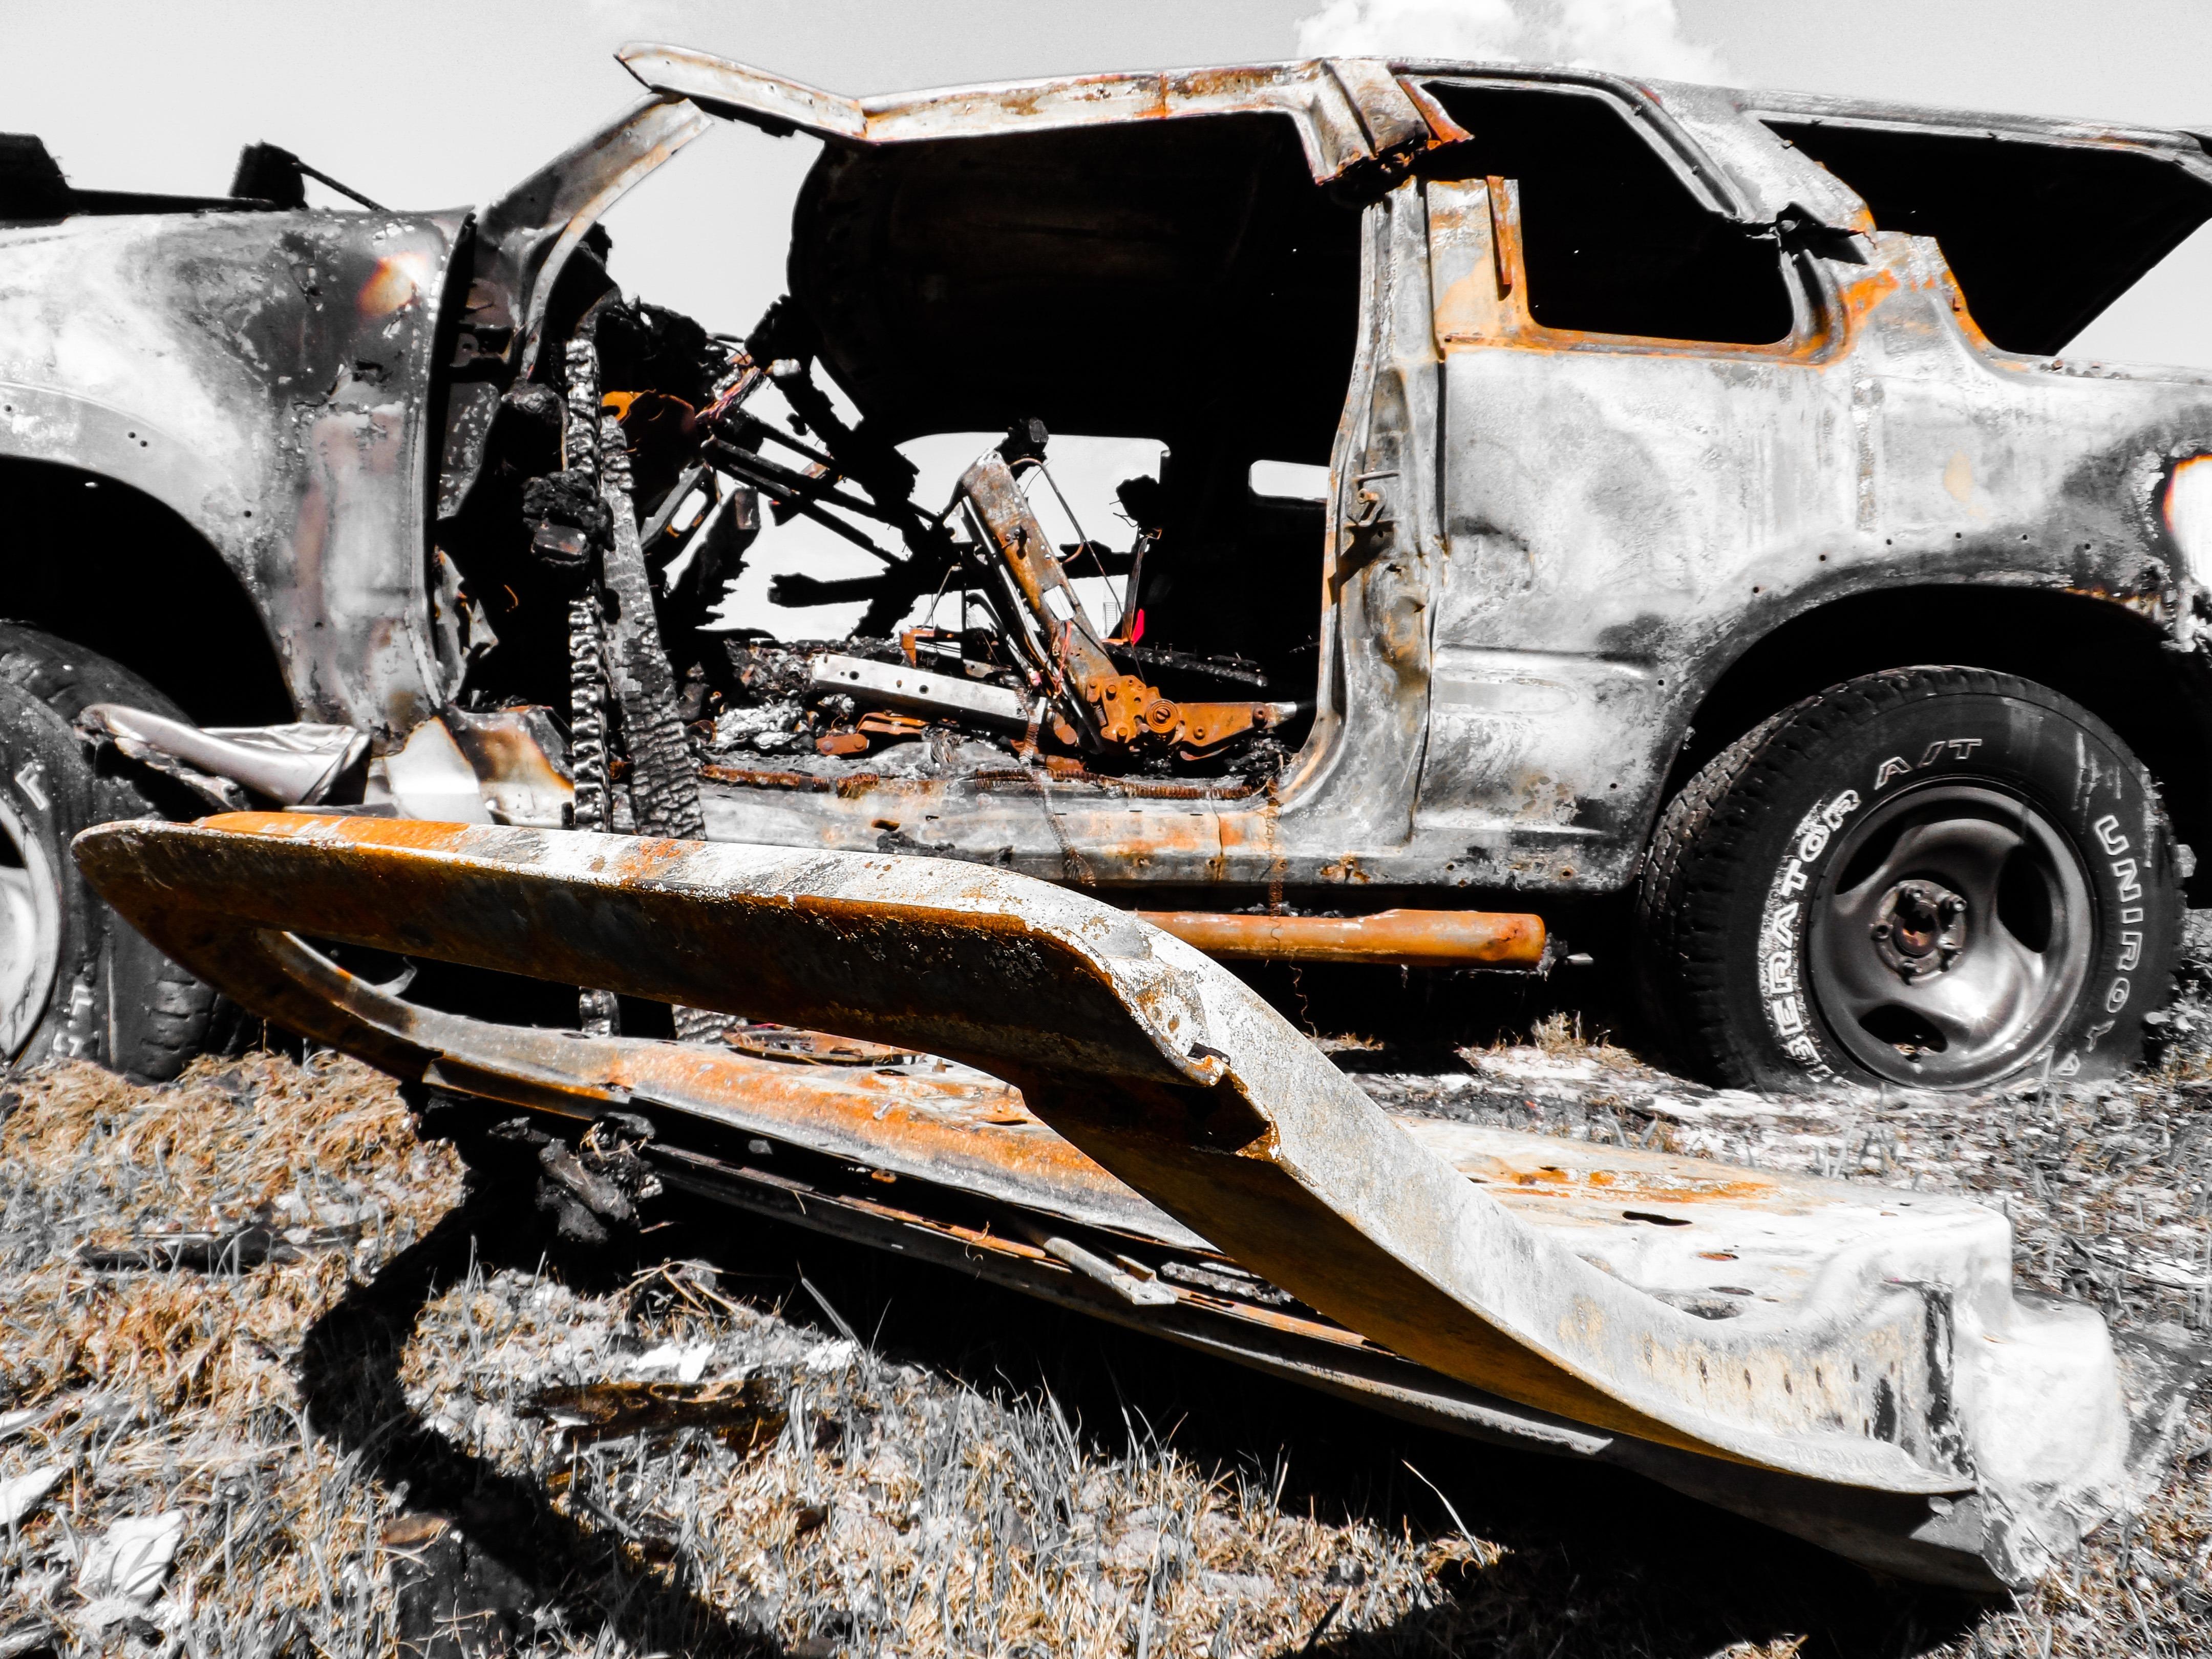 Free Images : car, wheel, transportation, truck, fire, auto, heat ...